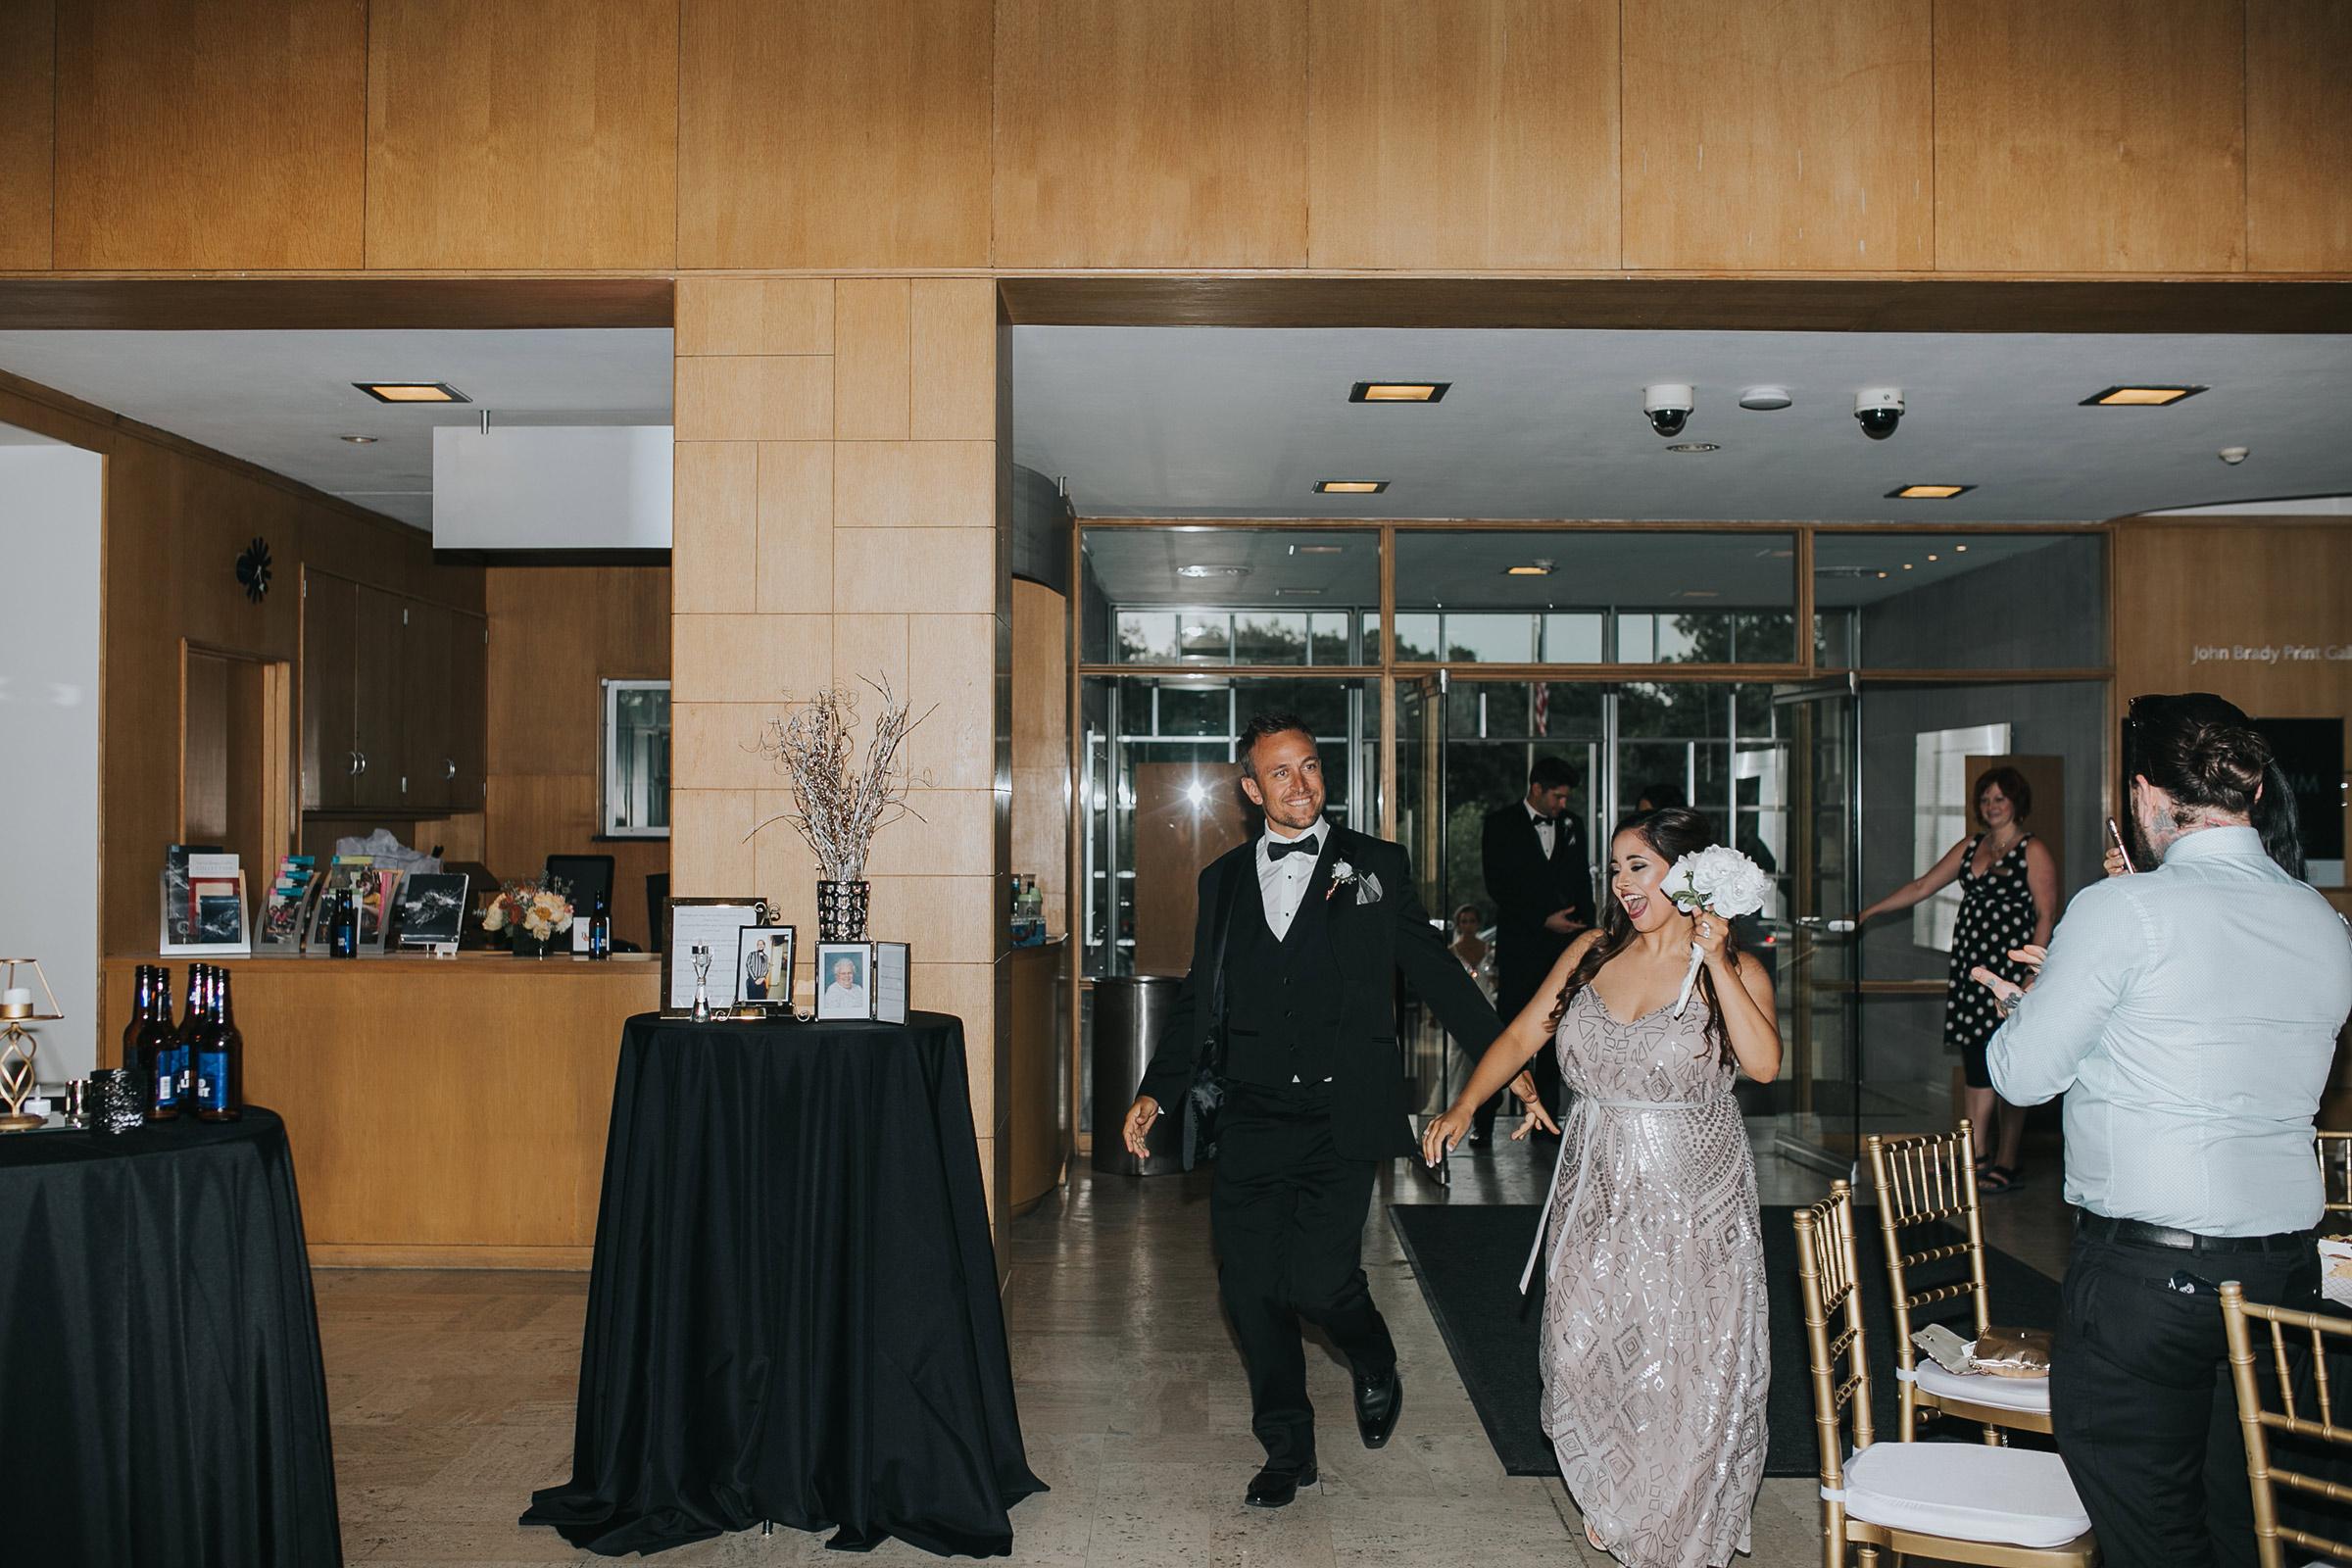 bridesmaid-groomsmen-walking-into--desmoines-iowa-art-center-raelyn-ramey-photography.jpg